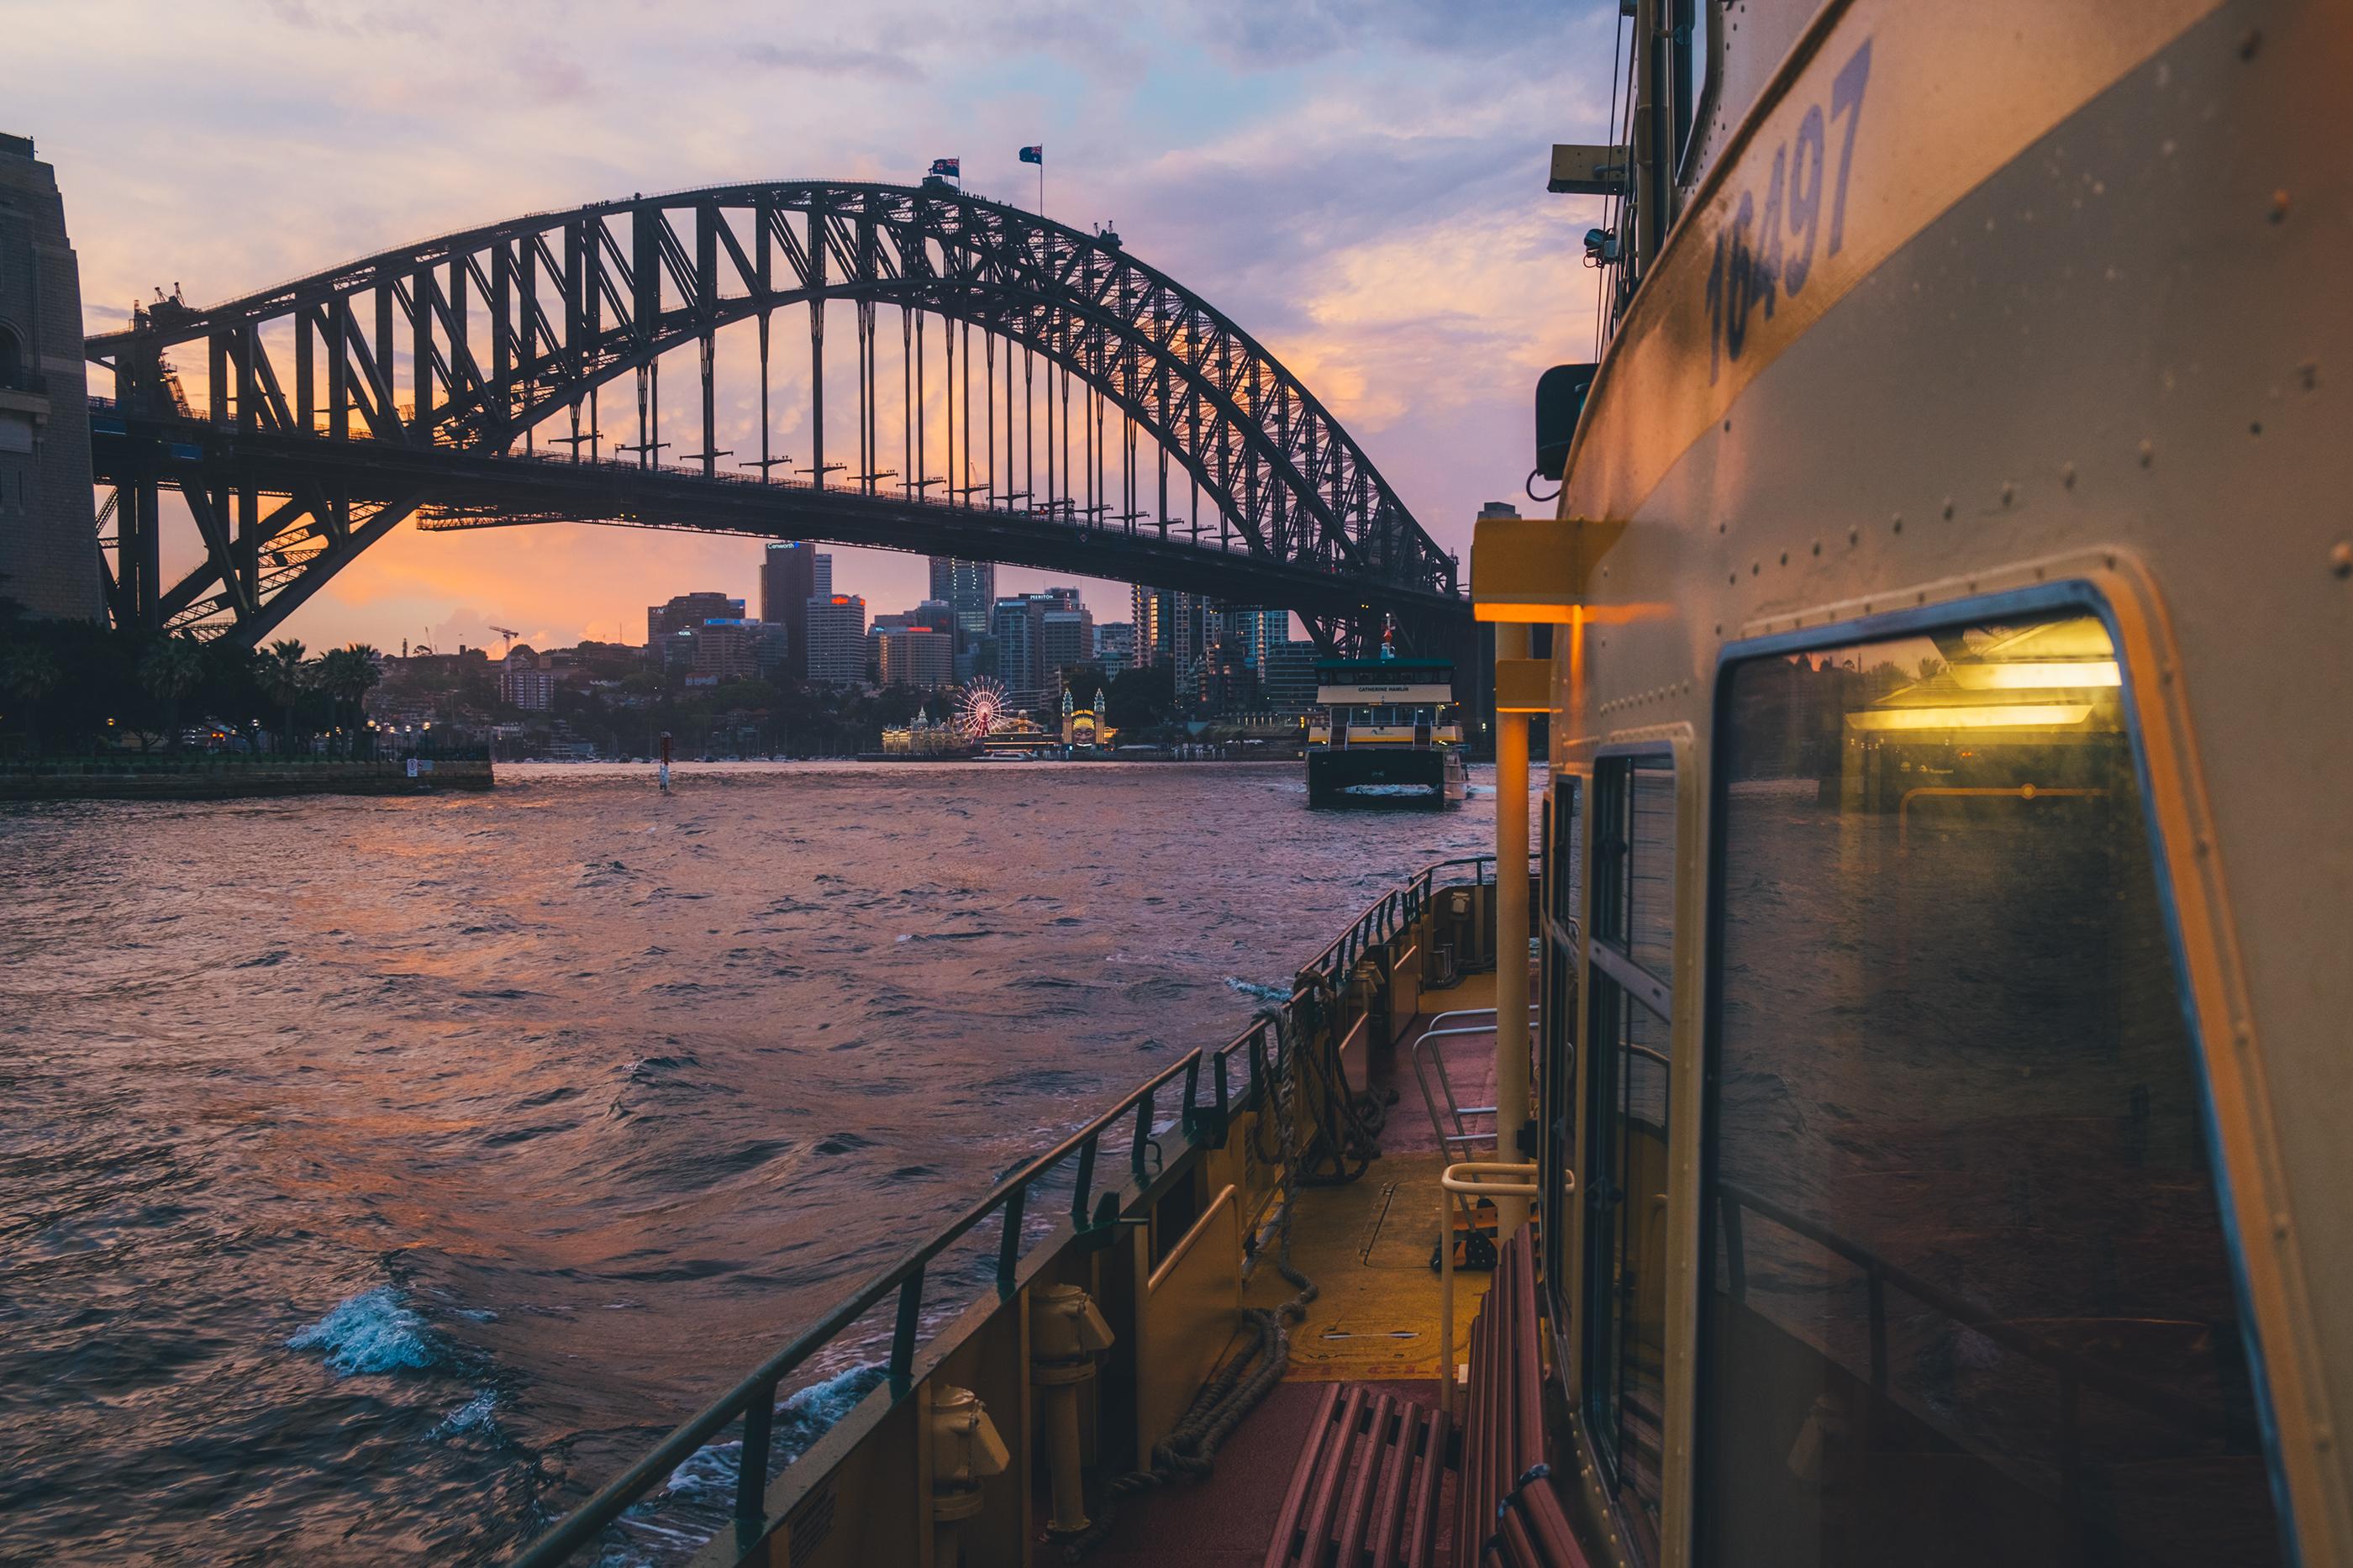 Harbour Bridge from Ferry in Sydney